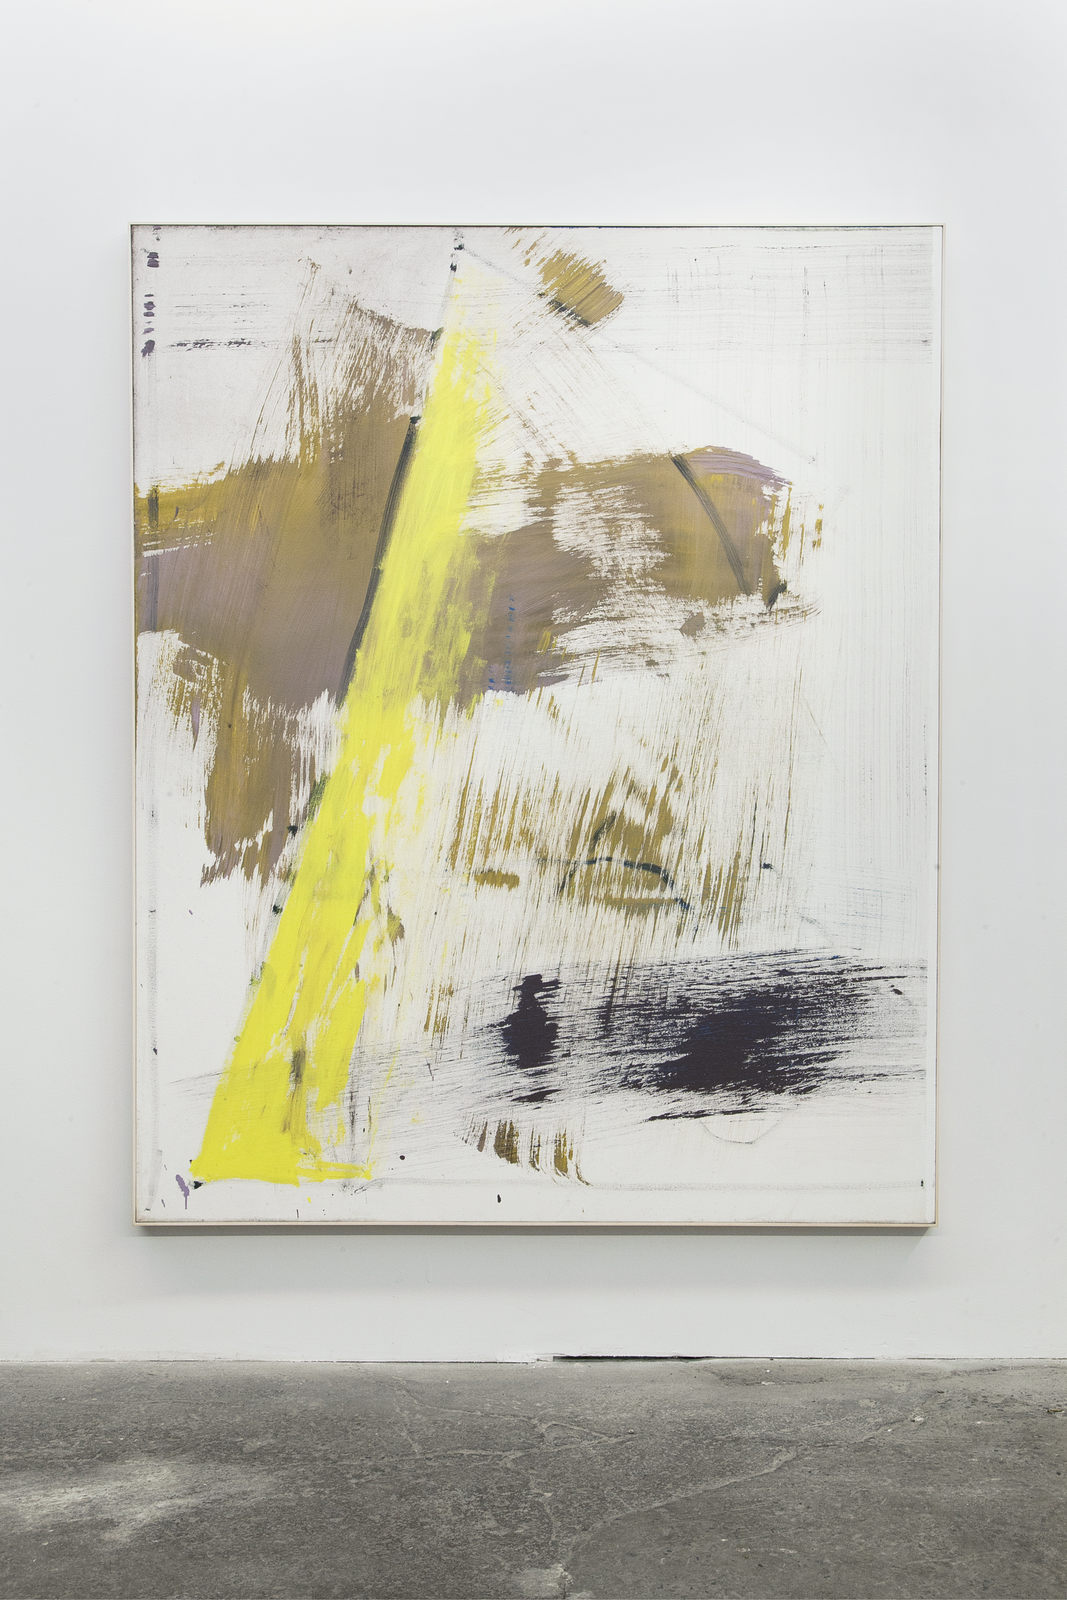 03_Jean-François Lauda. Untitled 35. Acrylic on canvas 193 x 152.5 cm. 2016